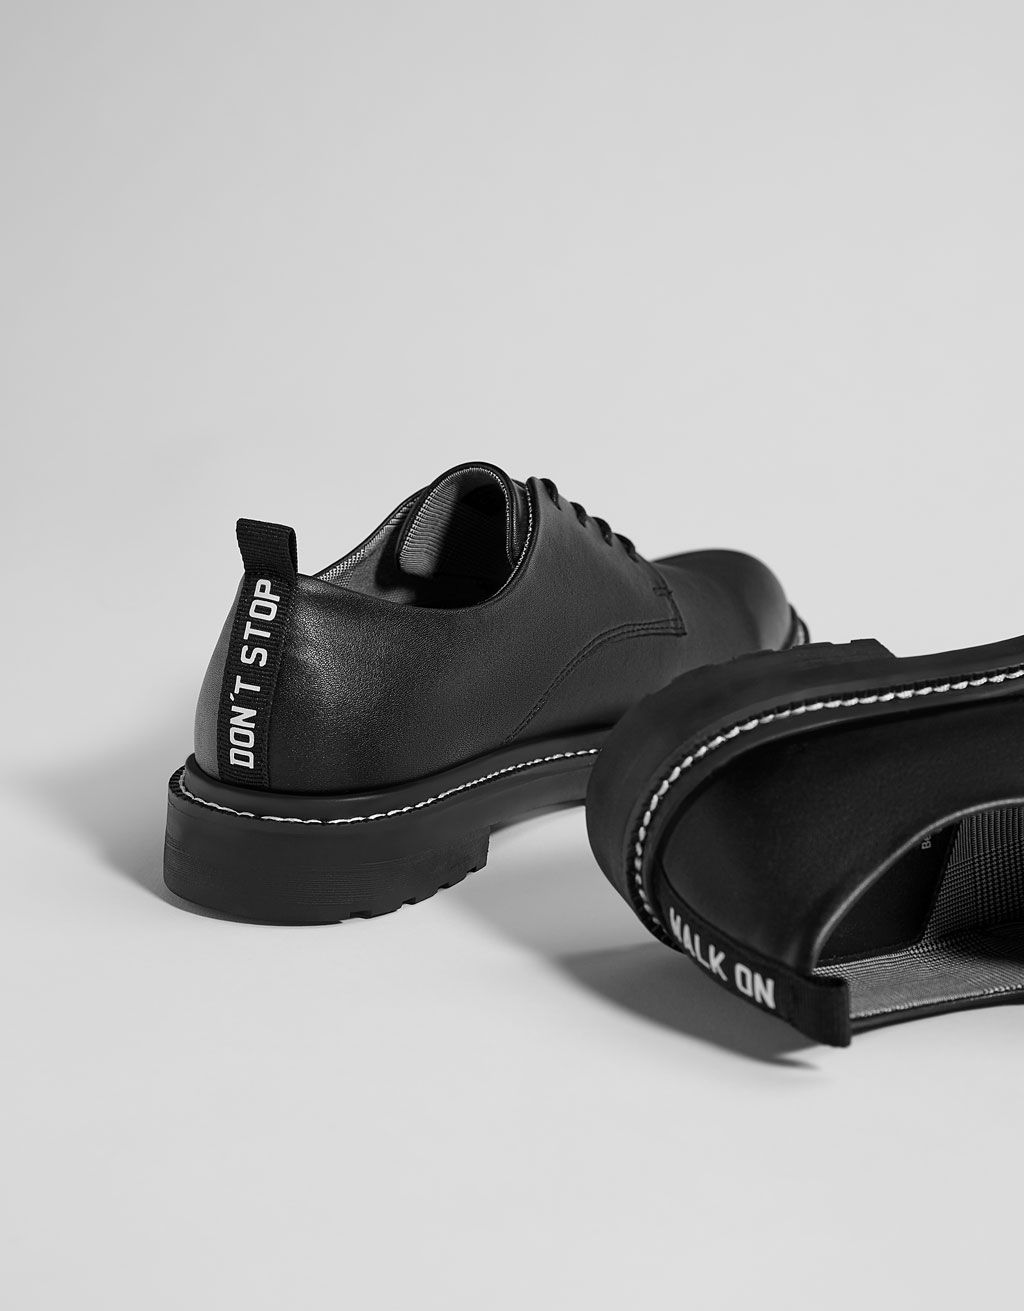 Bershka Shoes Shoes Fashion Photography Casual Oxford Shoes Shoes